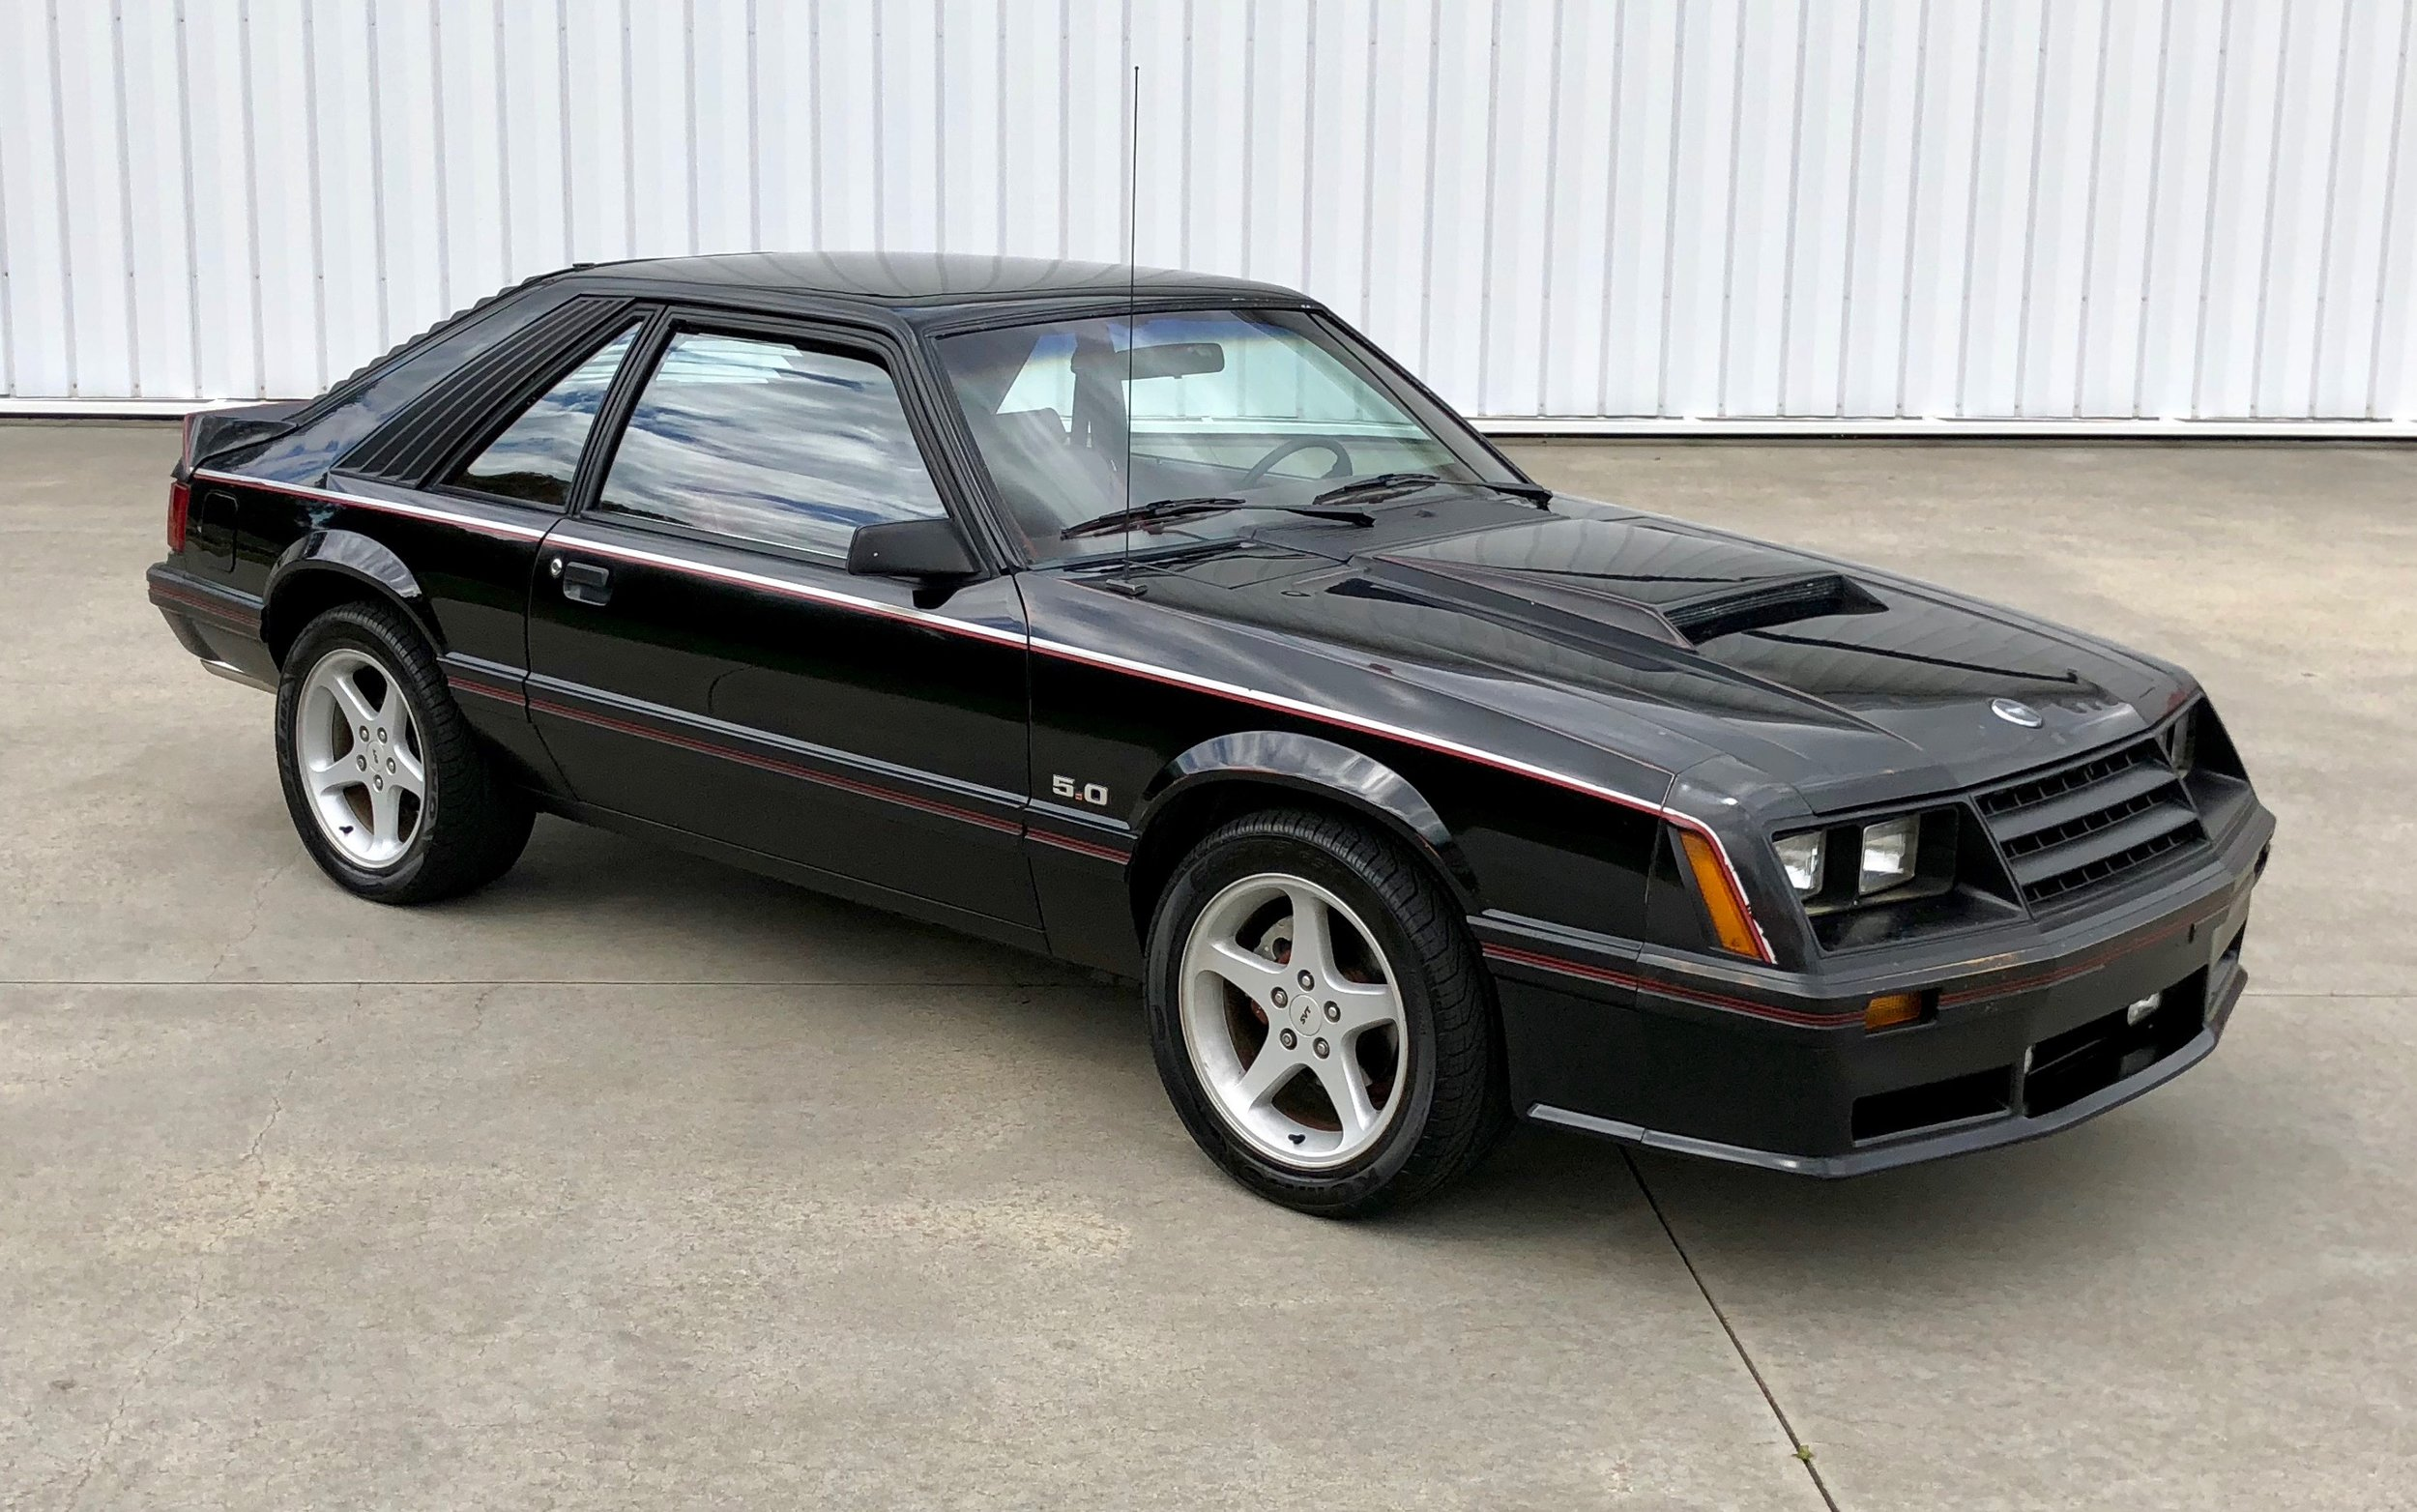 1982 Mustang Gt >> 1982 Mustang Gt Upcoming New Car Release 2020